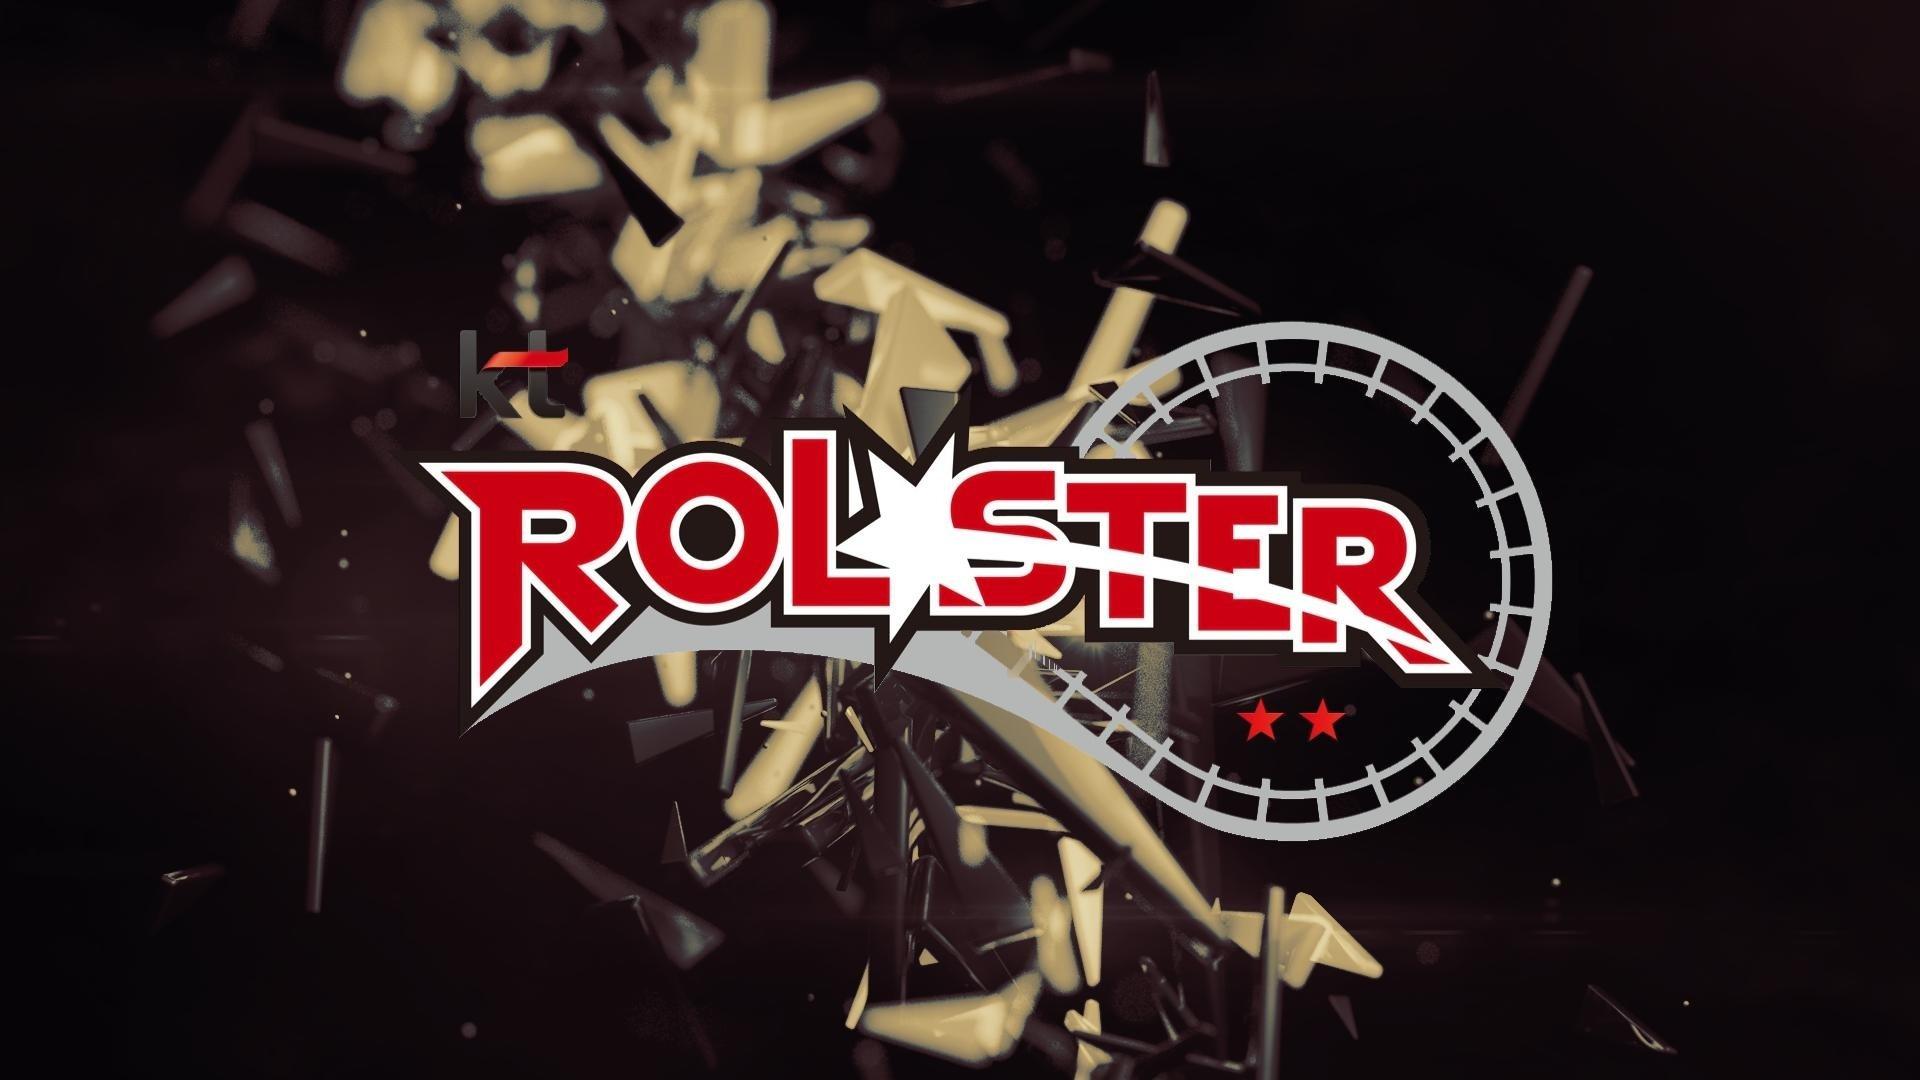 kt_rolster3